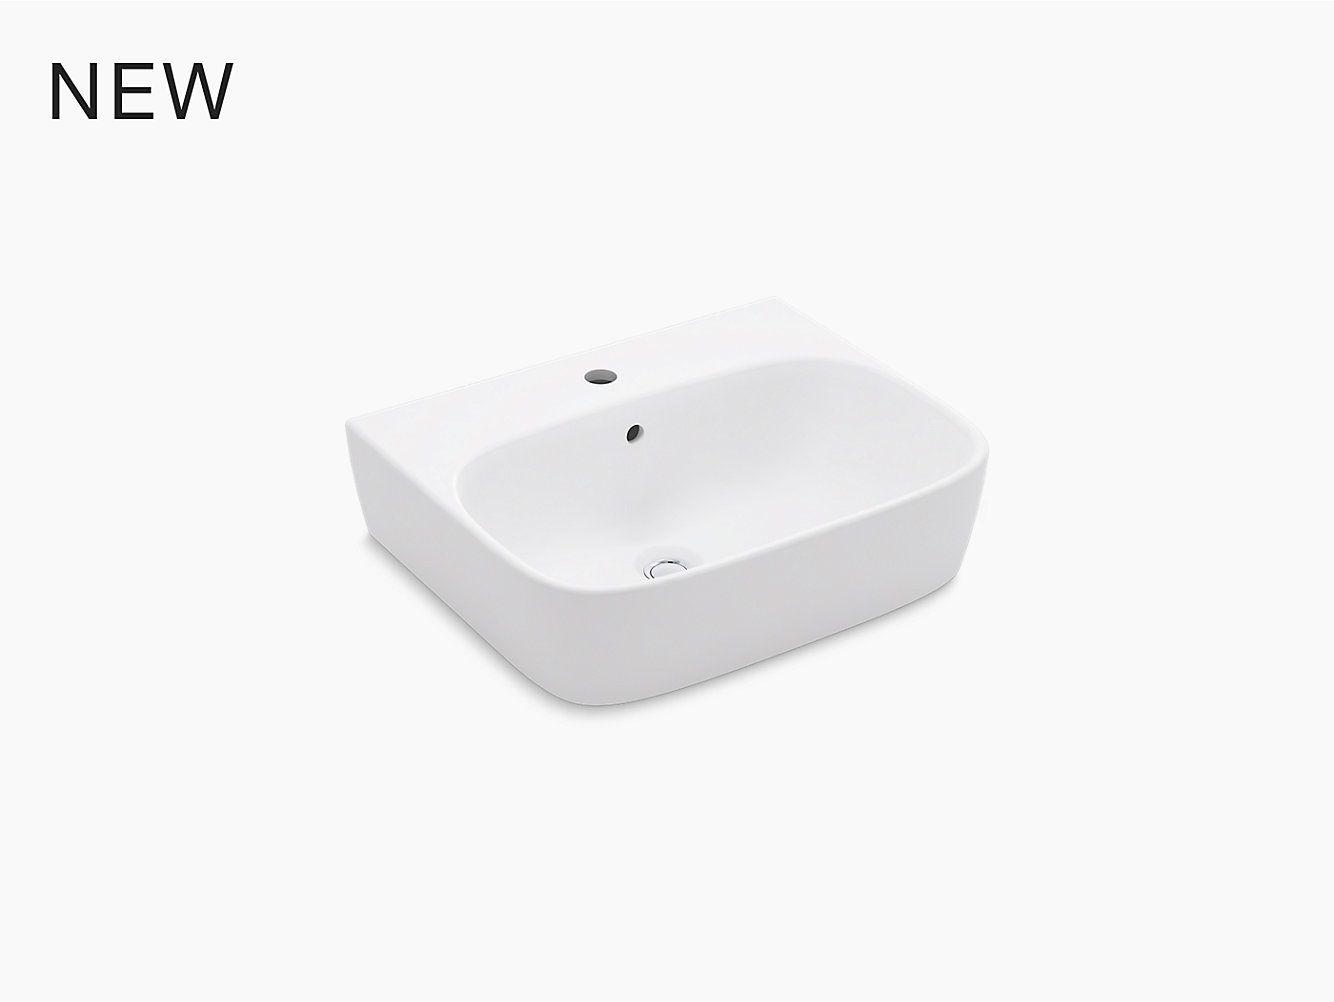 K 77767 1 Modernlife Wall Mounted Bathroom Sink With Single Center Mounted Faucet Hole And Rectangular Basin Kohler In 2020 Bathroom Sink Basin Sink